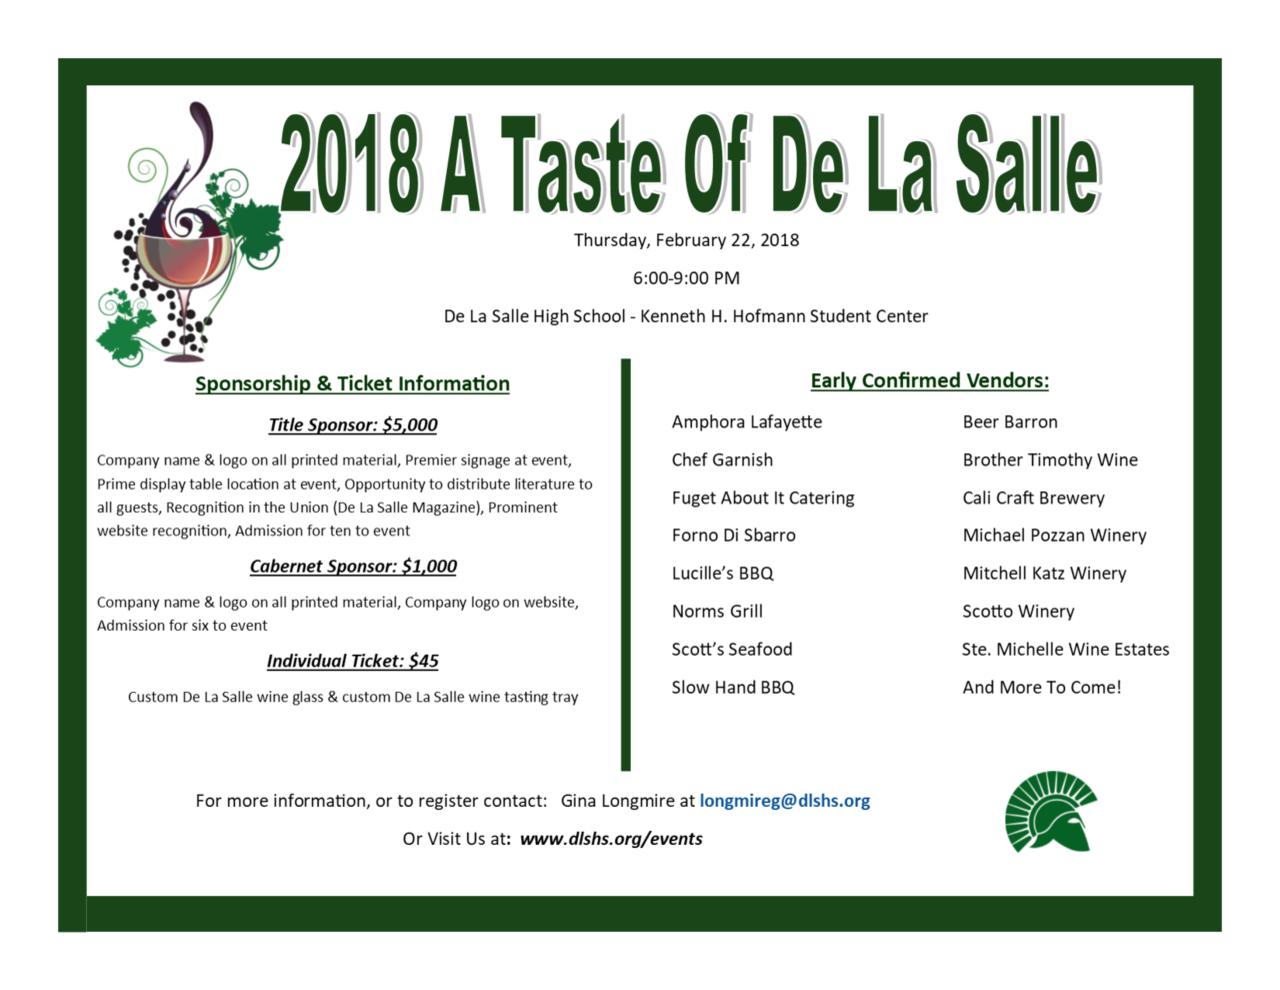 De La Salle High School - A Taste of De La Salle